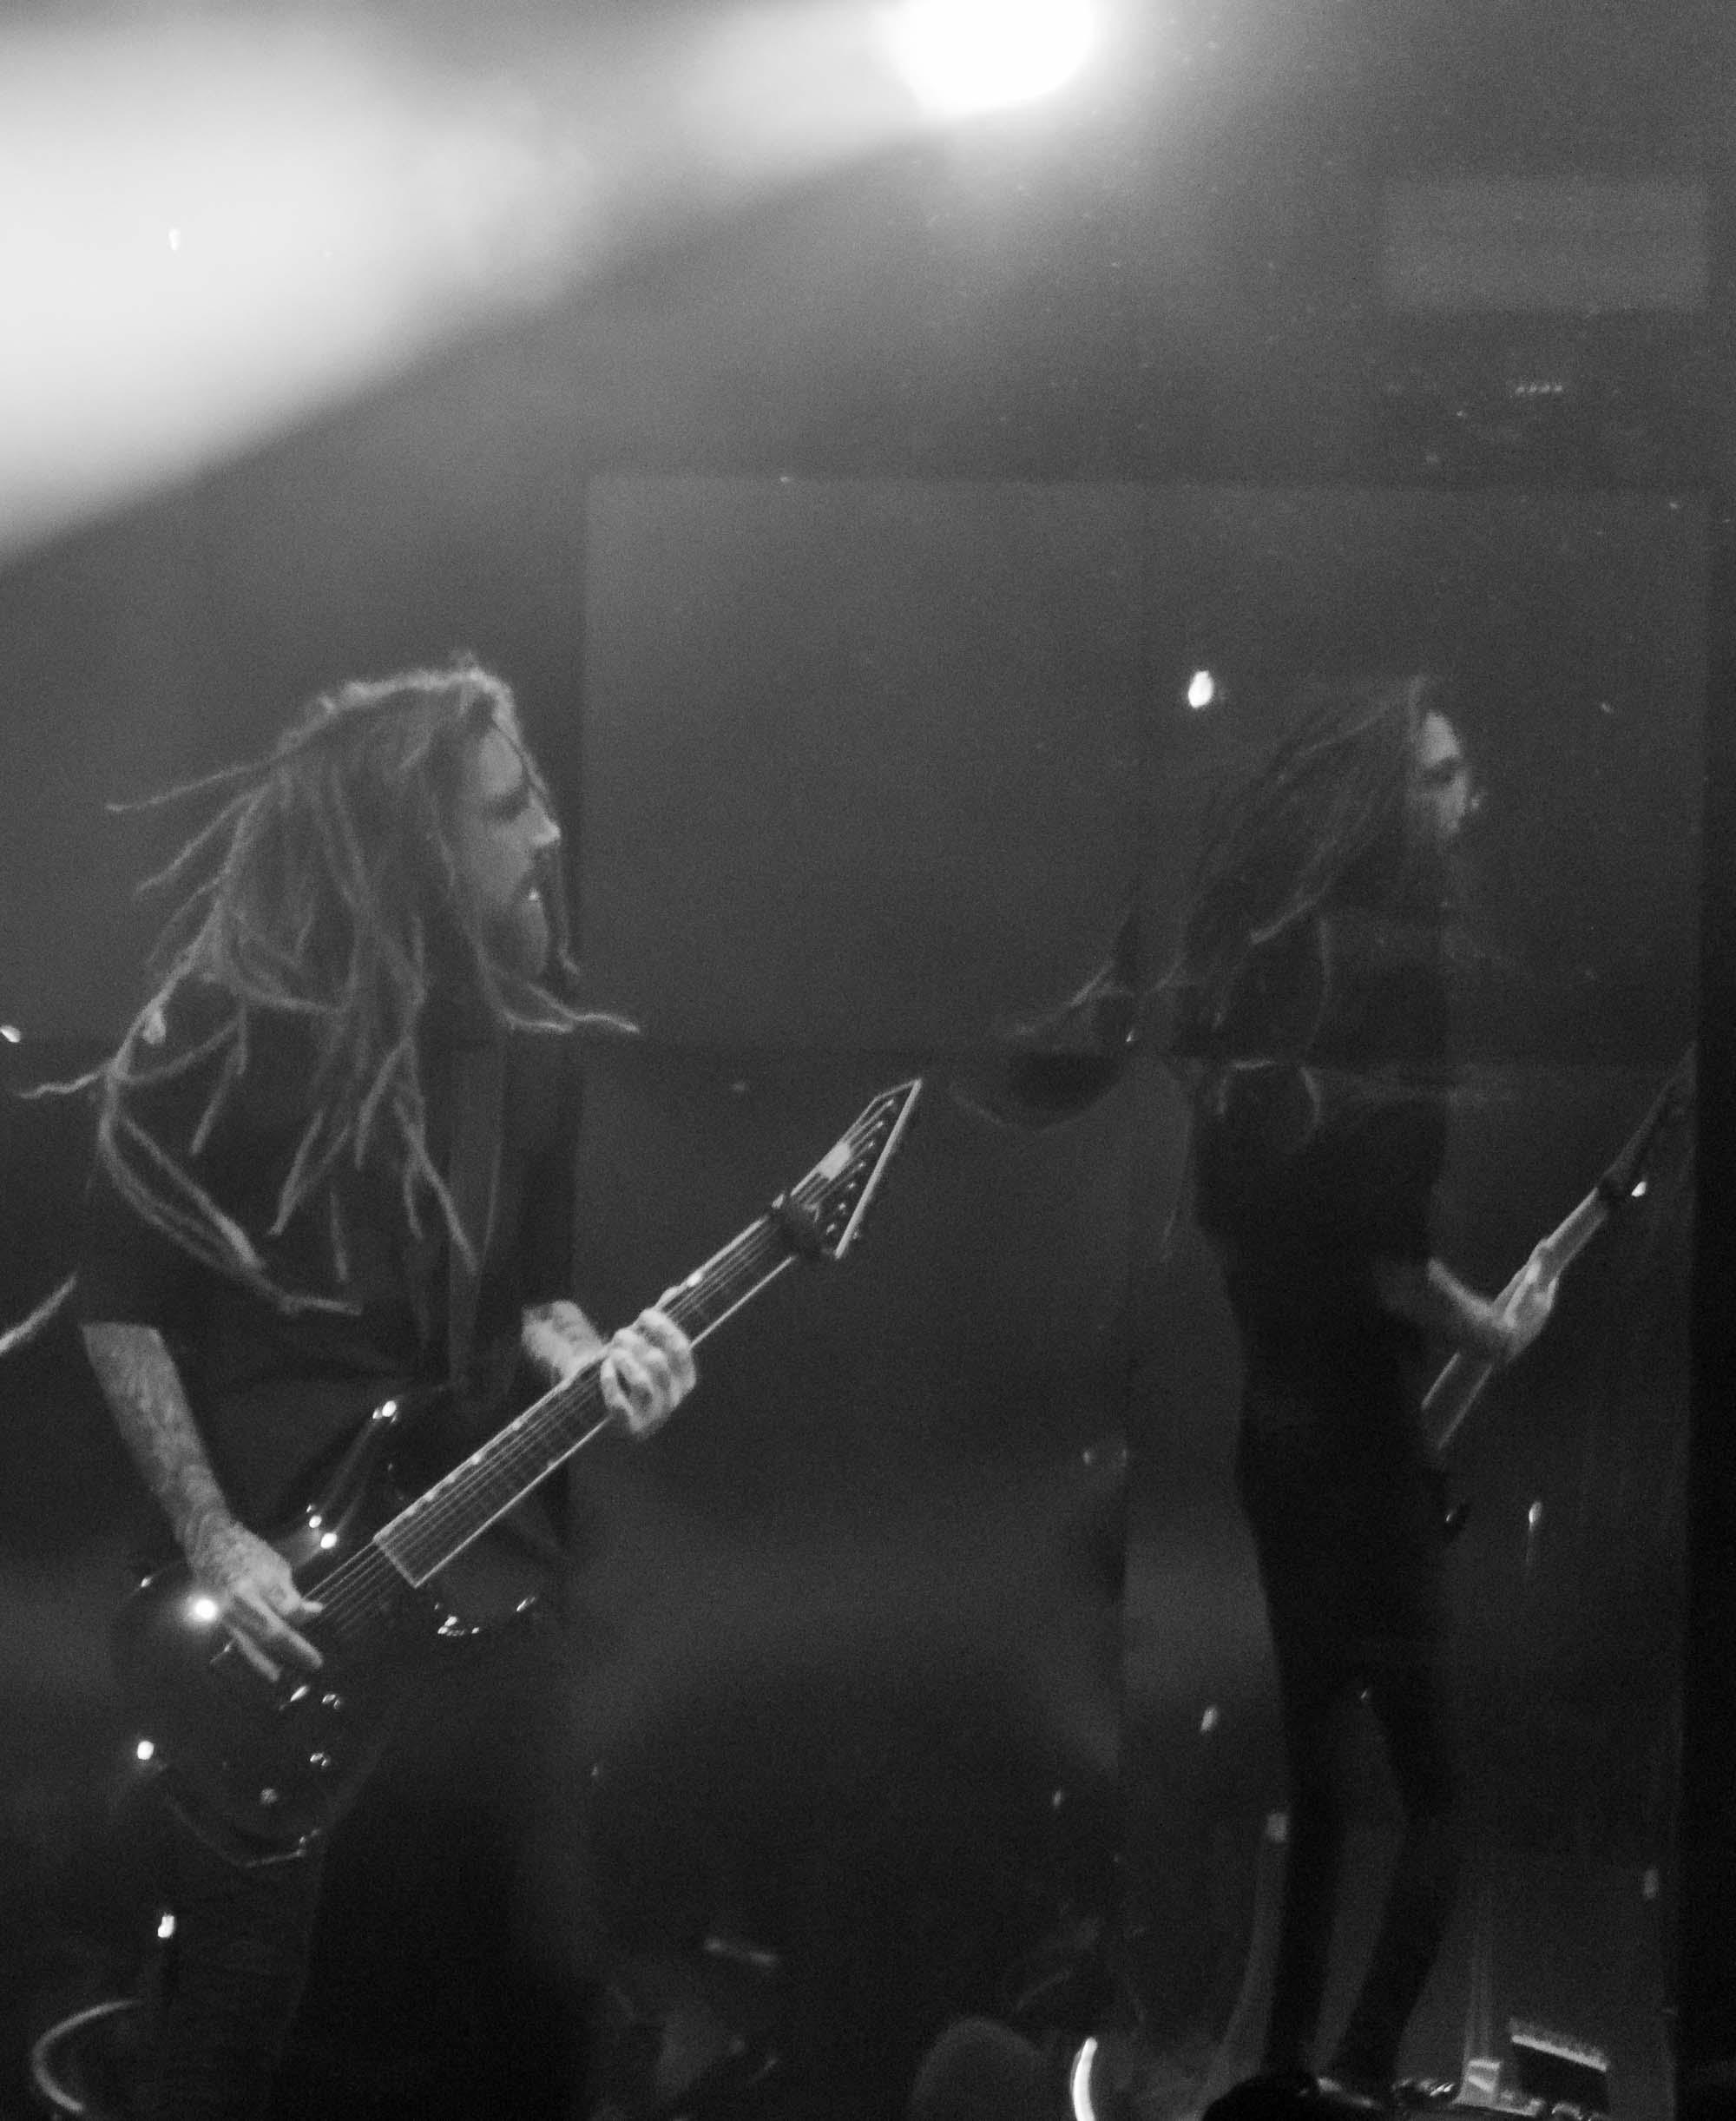 Korn-BudweiserStage-Toronto_Ontario-20190814-JeremyGretzinger4